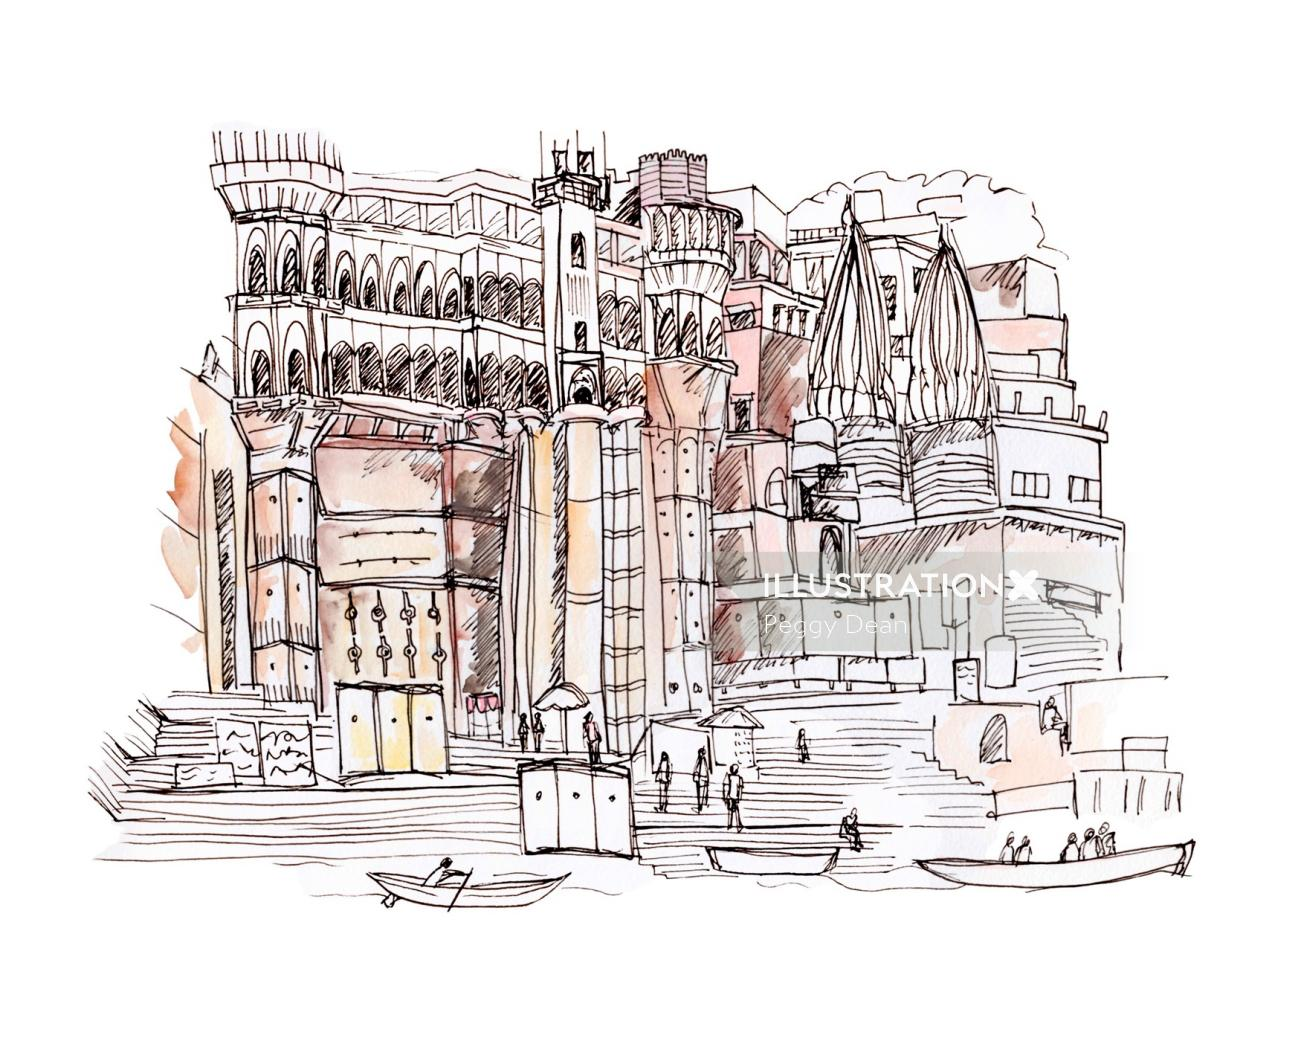 Architecture illustration of Varanasi in India